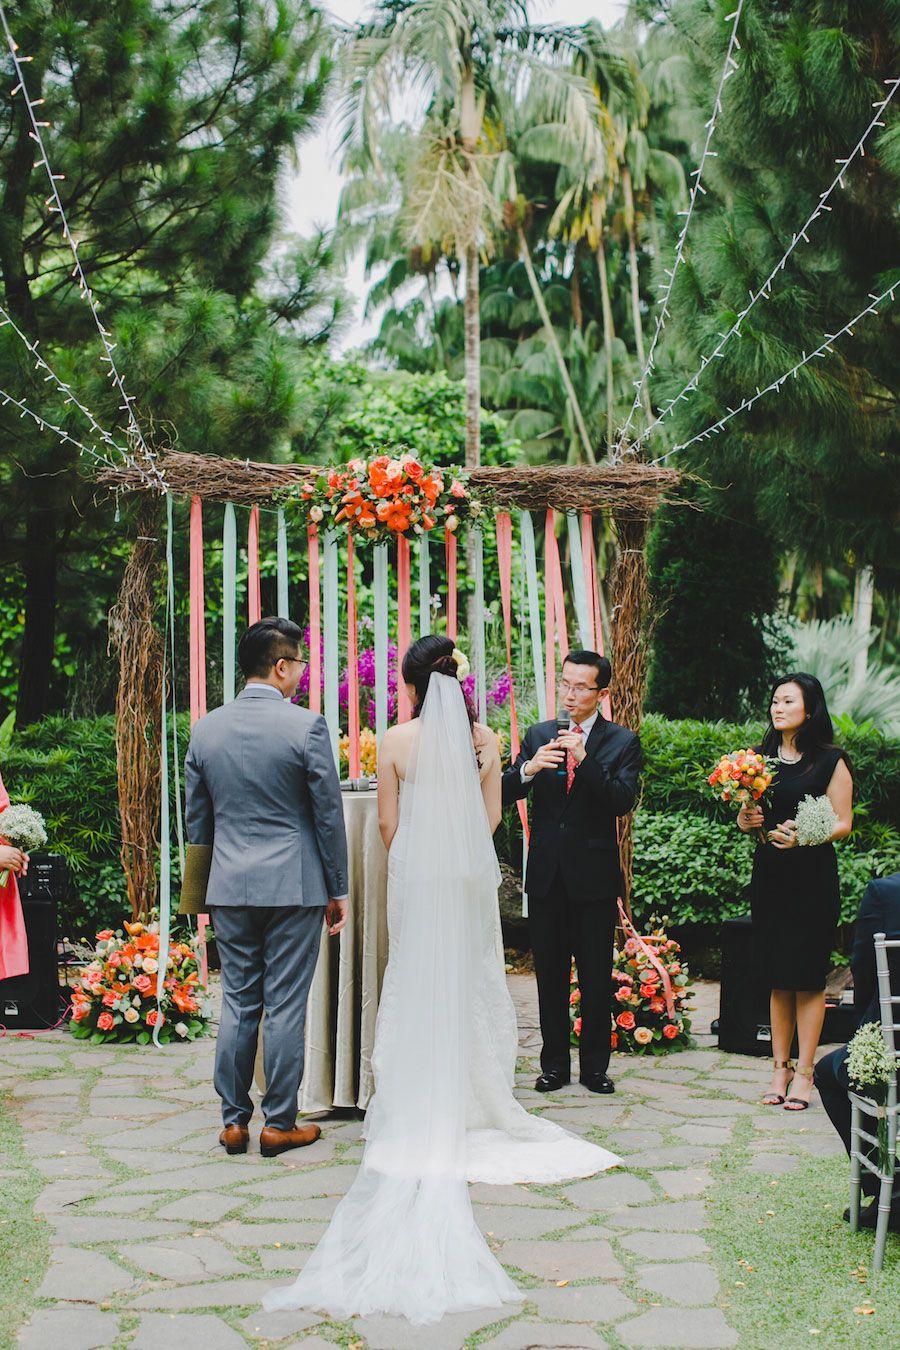 Desmond And Lay Pengs Rustic Garden Wedding At Singapore Botanic Gardens